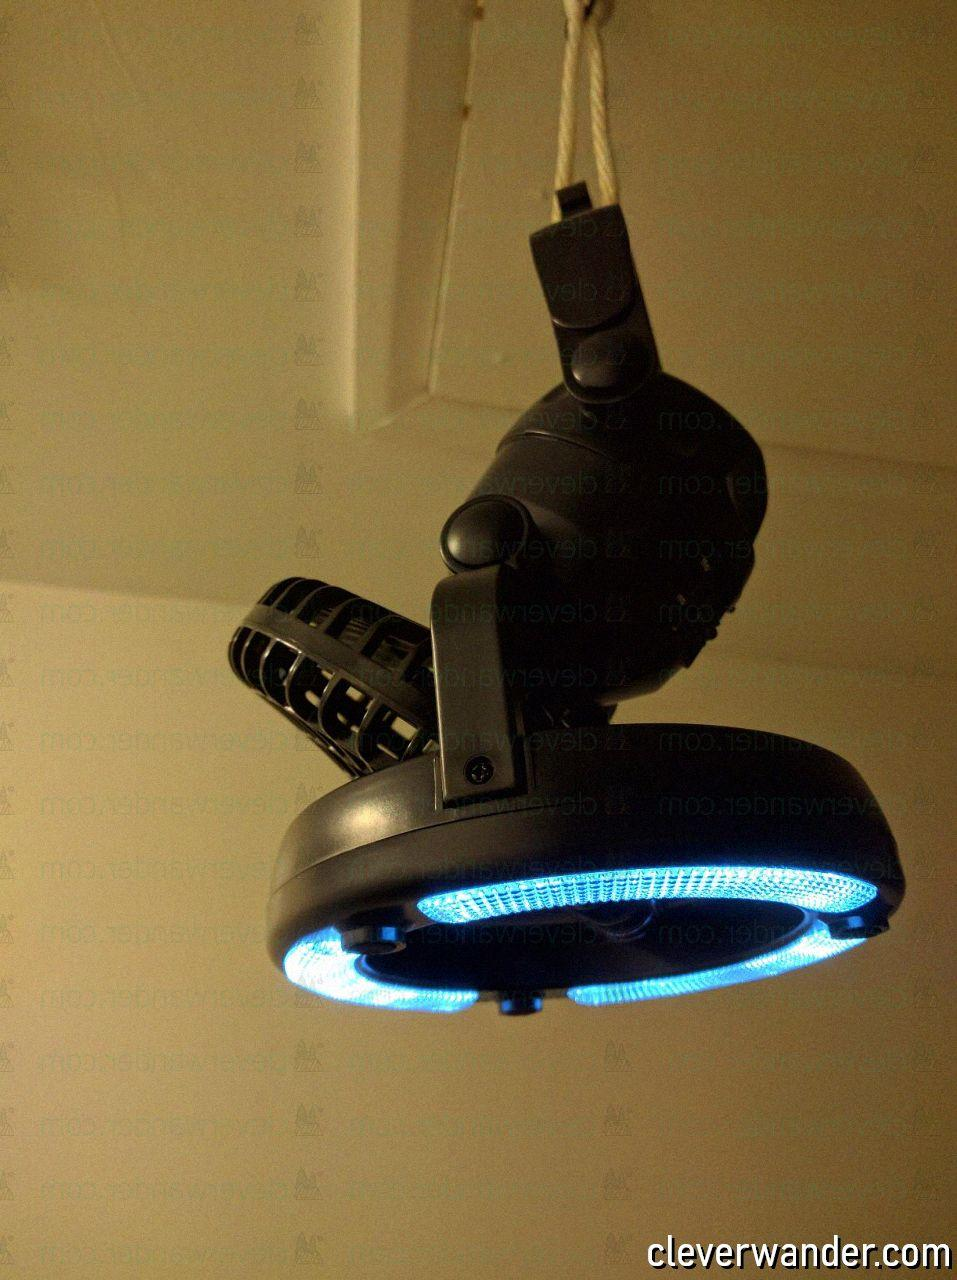 Odoland Portable LED Camping Lantern - image review 3